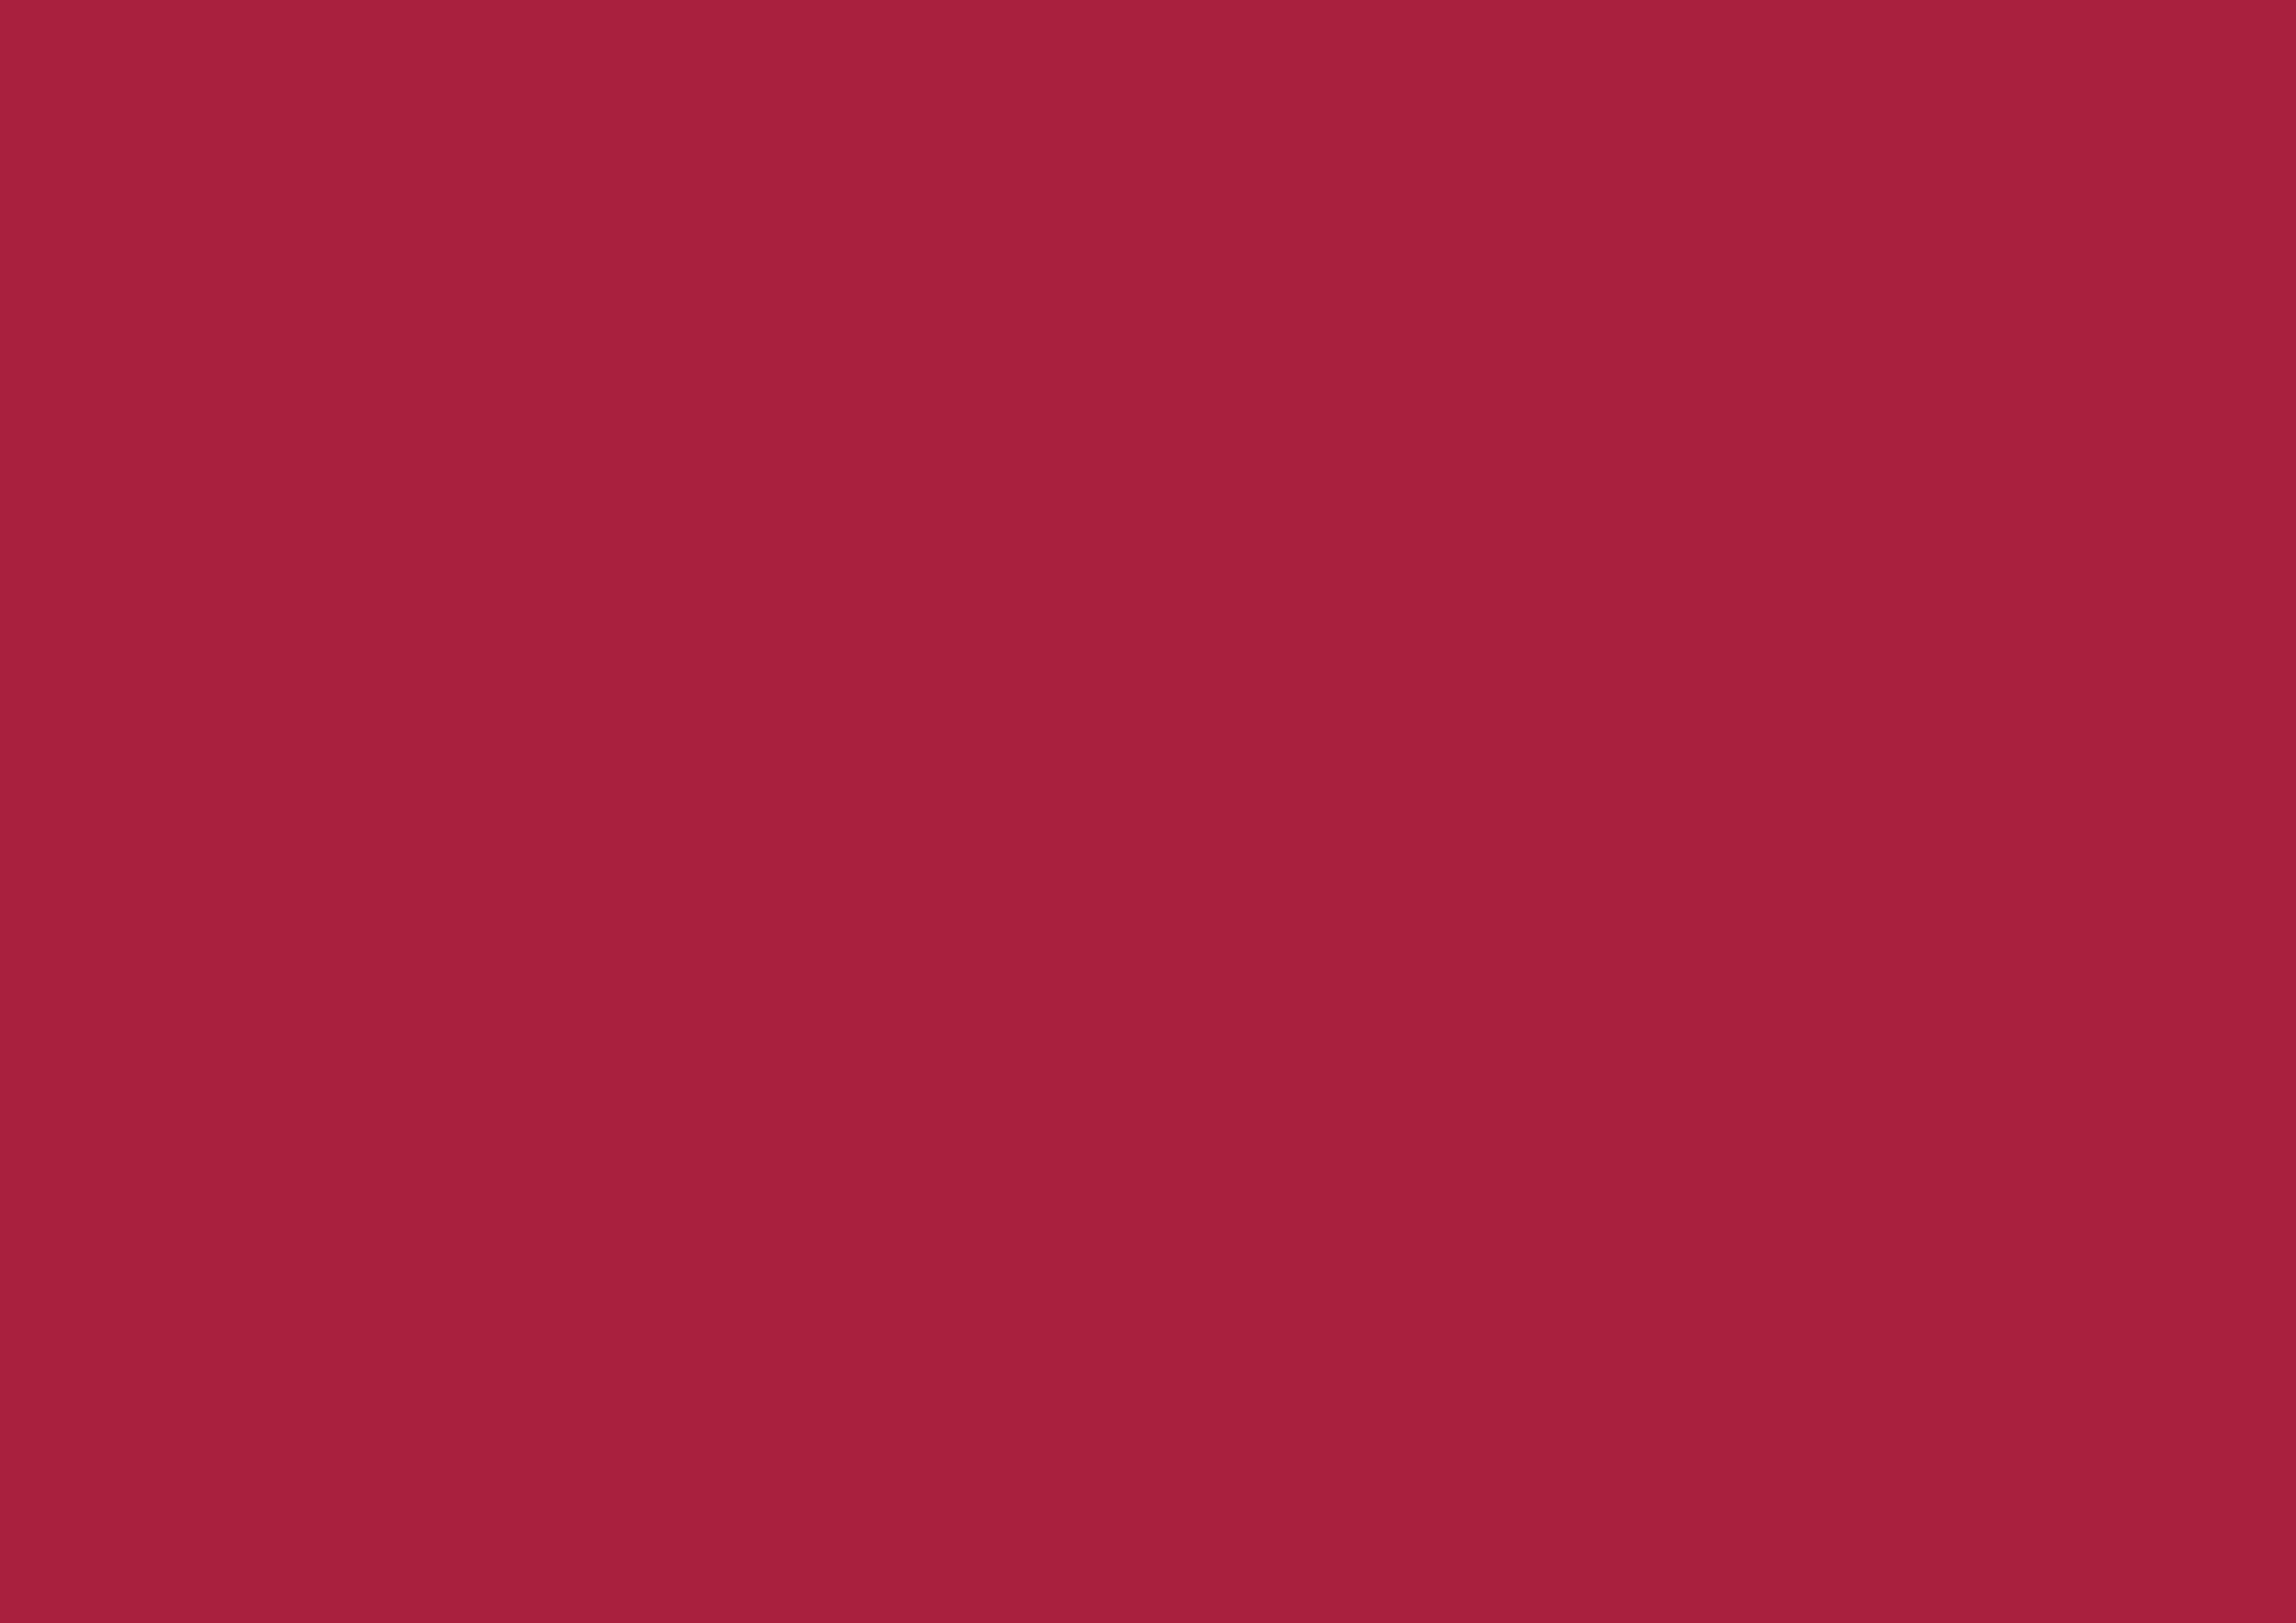 3508x2480 Deep Carmine Solid Color Background